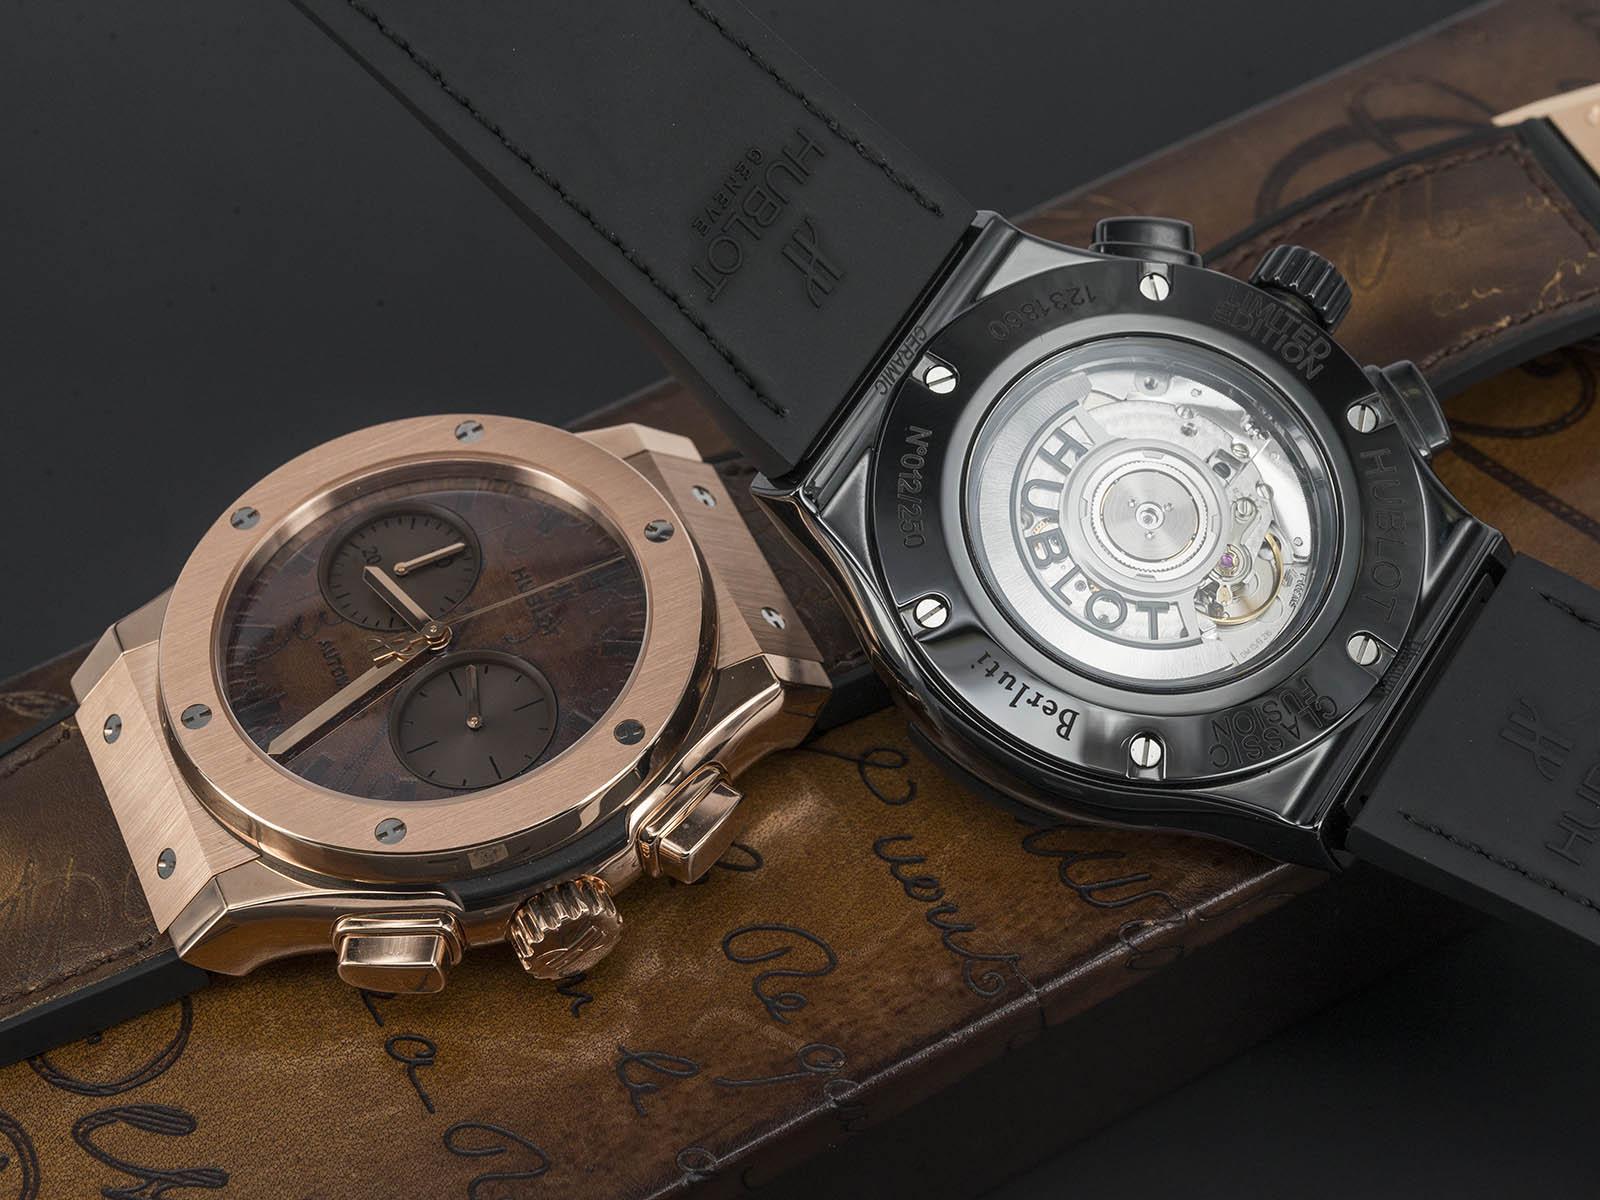 hublot-classic-fusion-berluti-chronograph-2.jpg